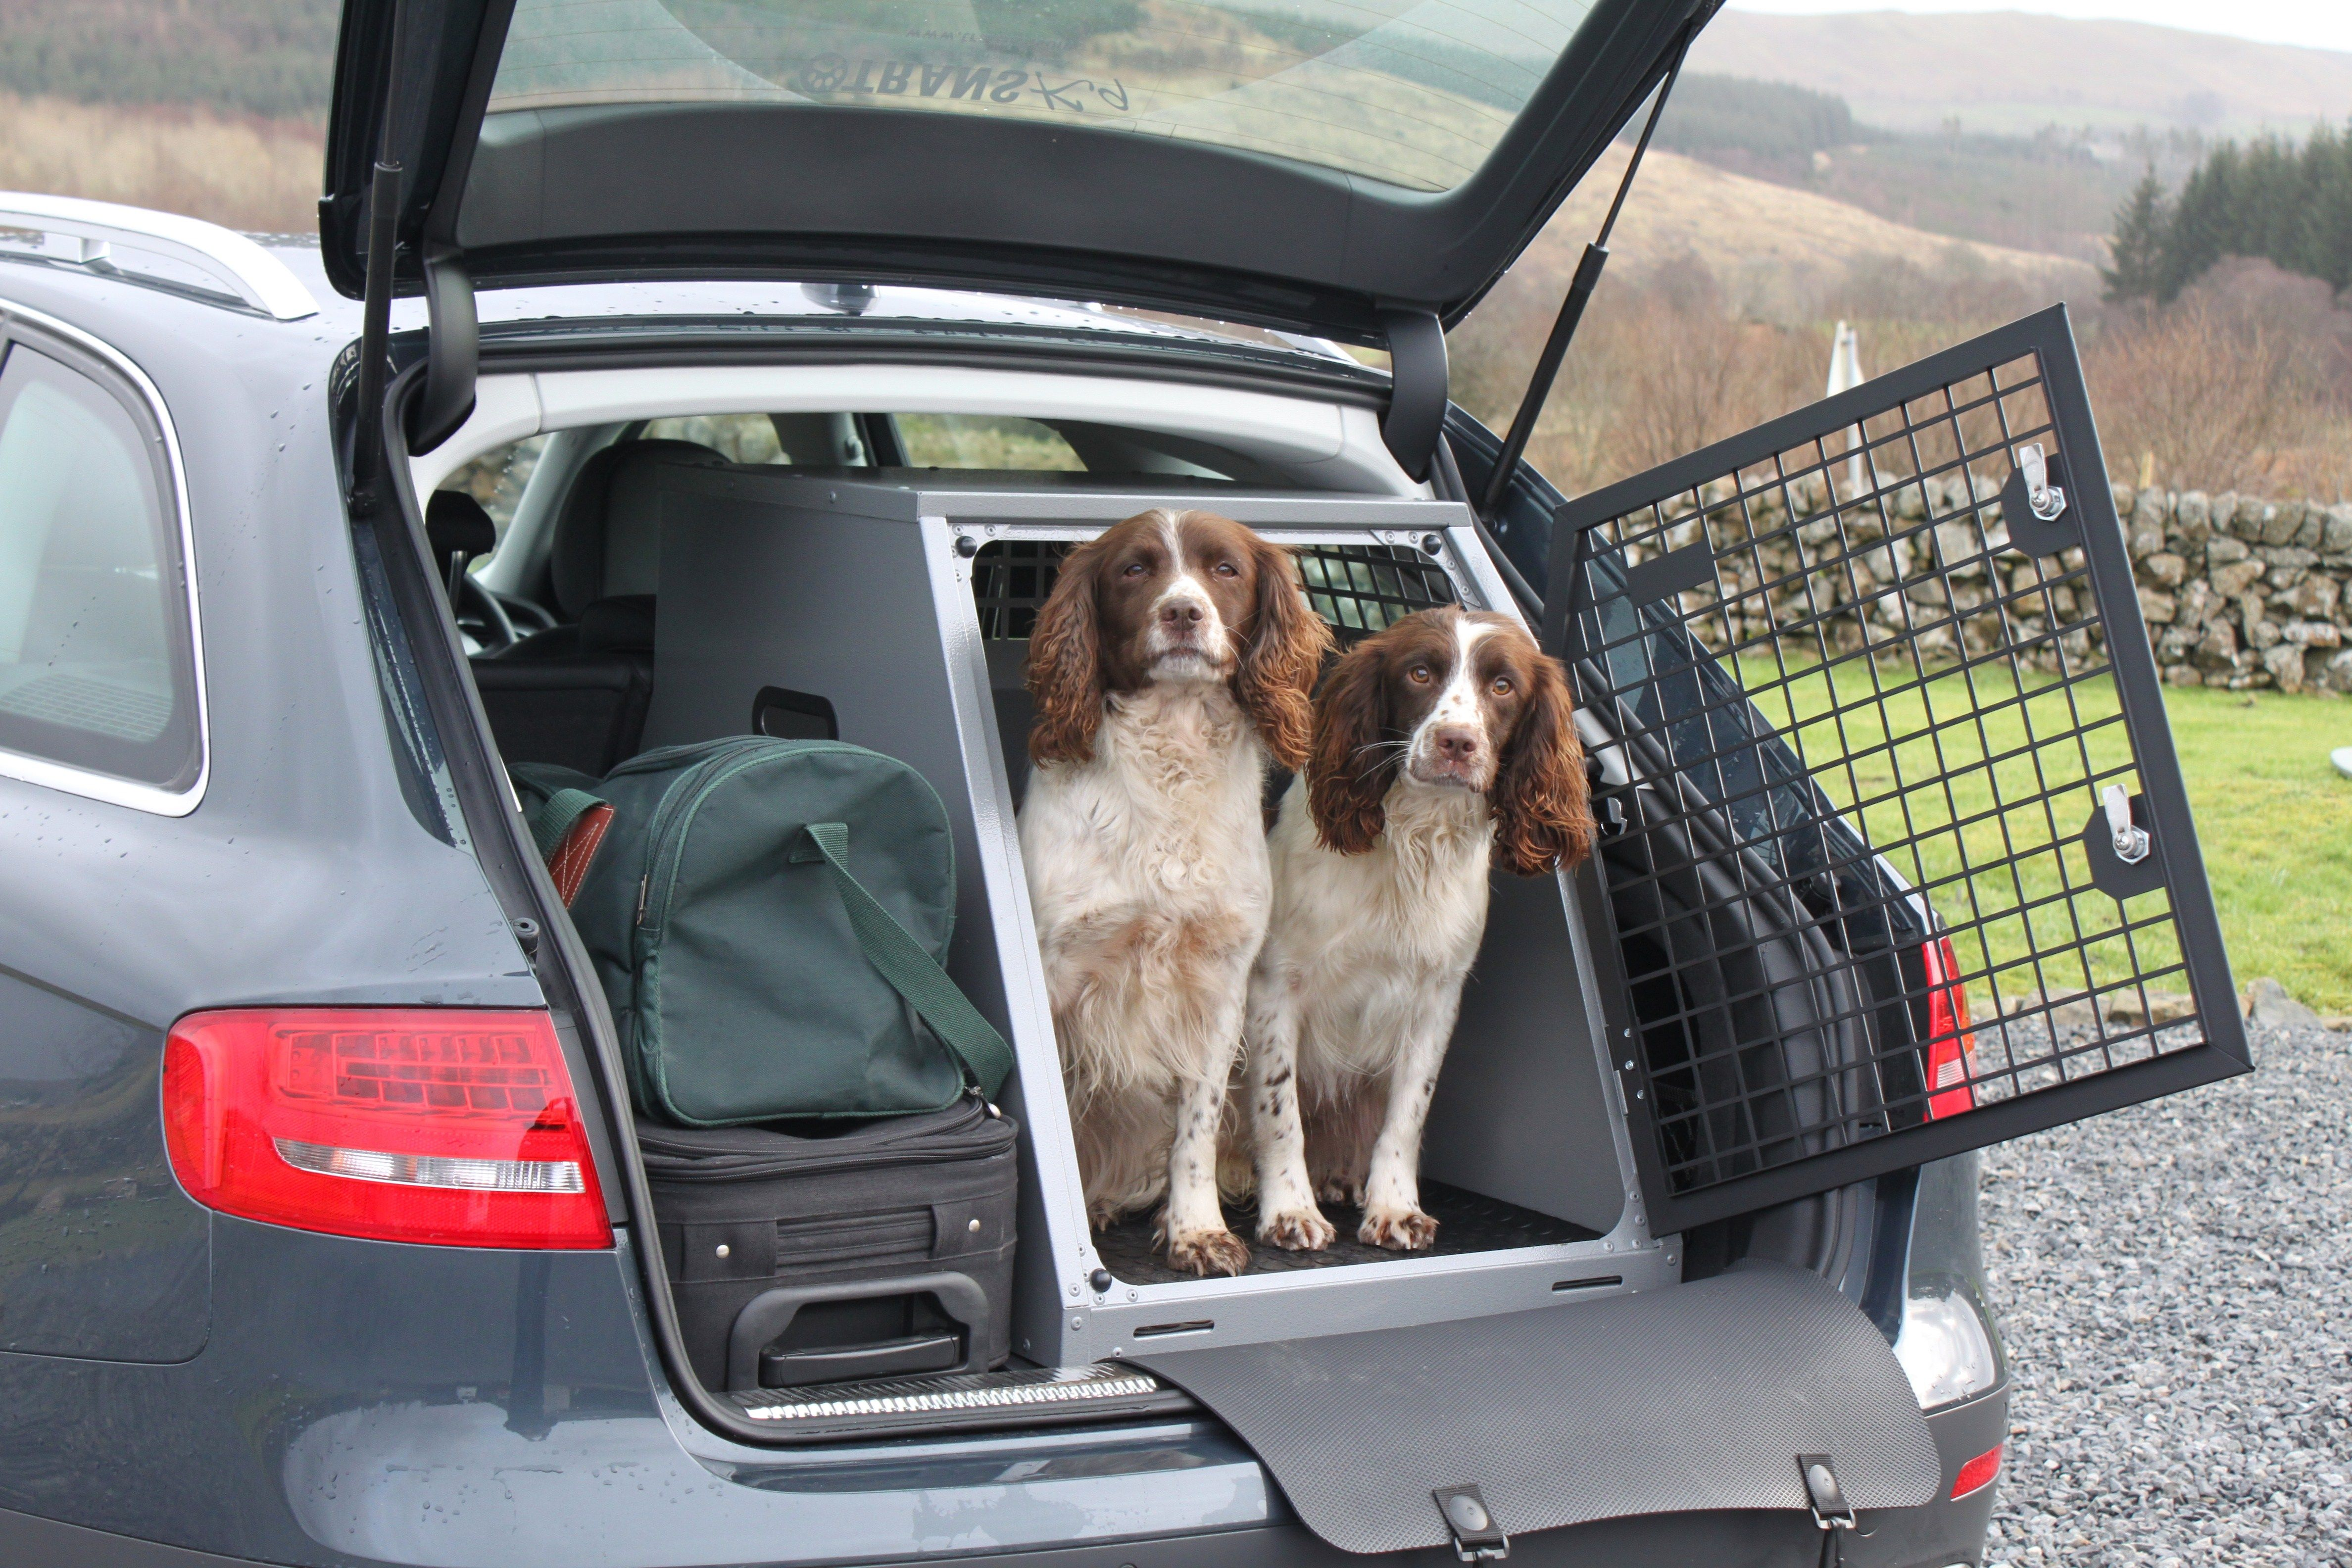 Transk9 B23 Audi A4 Avant Dog Crate Dog Transit Box Dog Cage Www